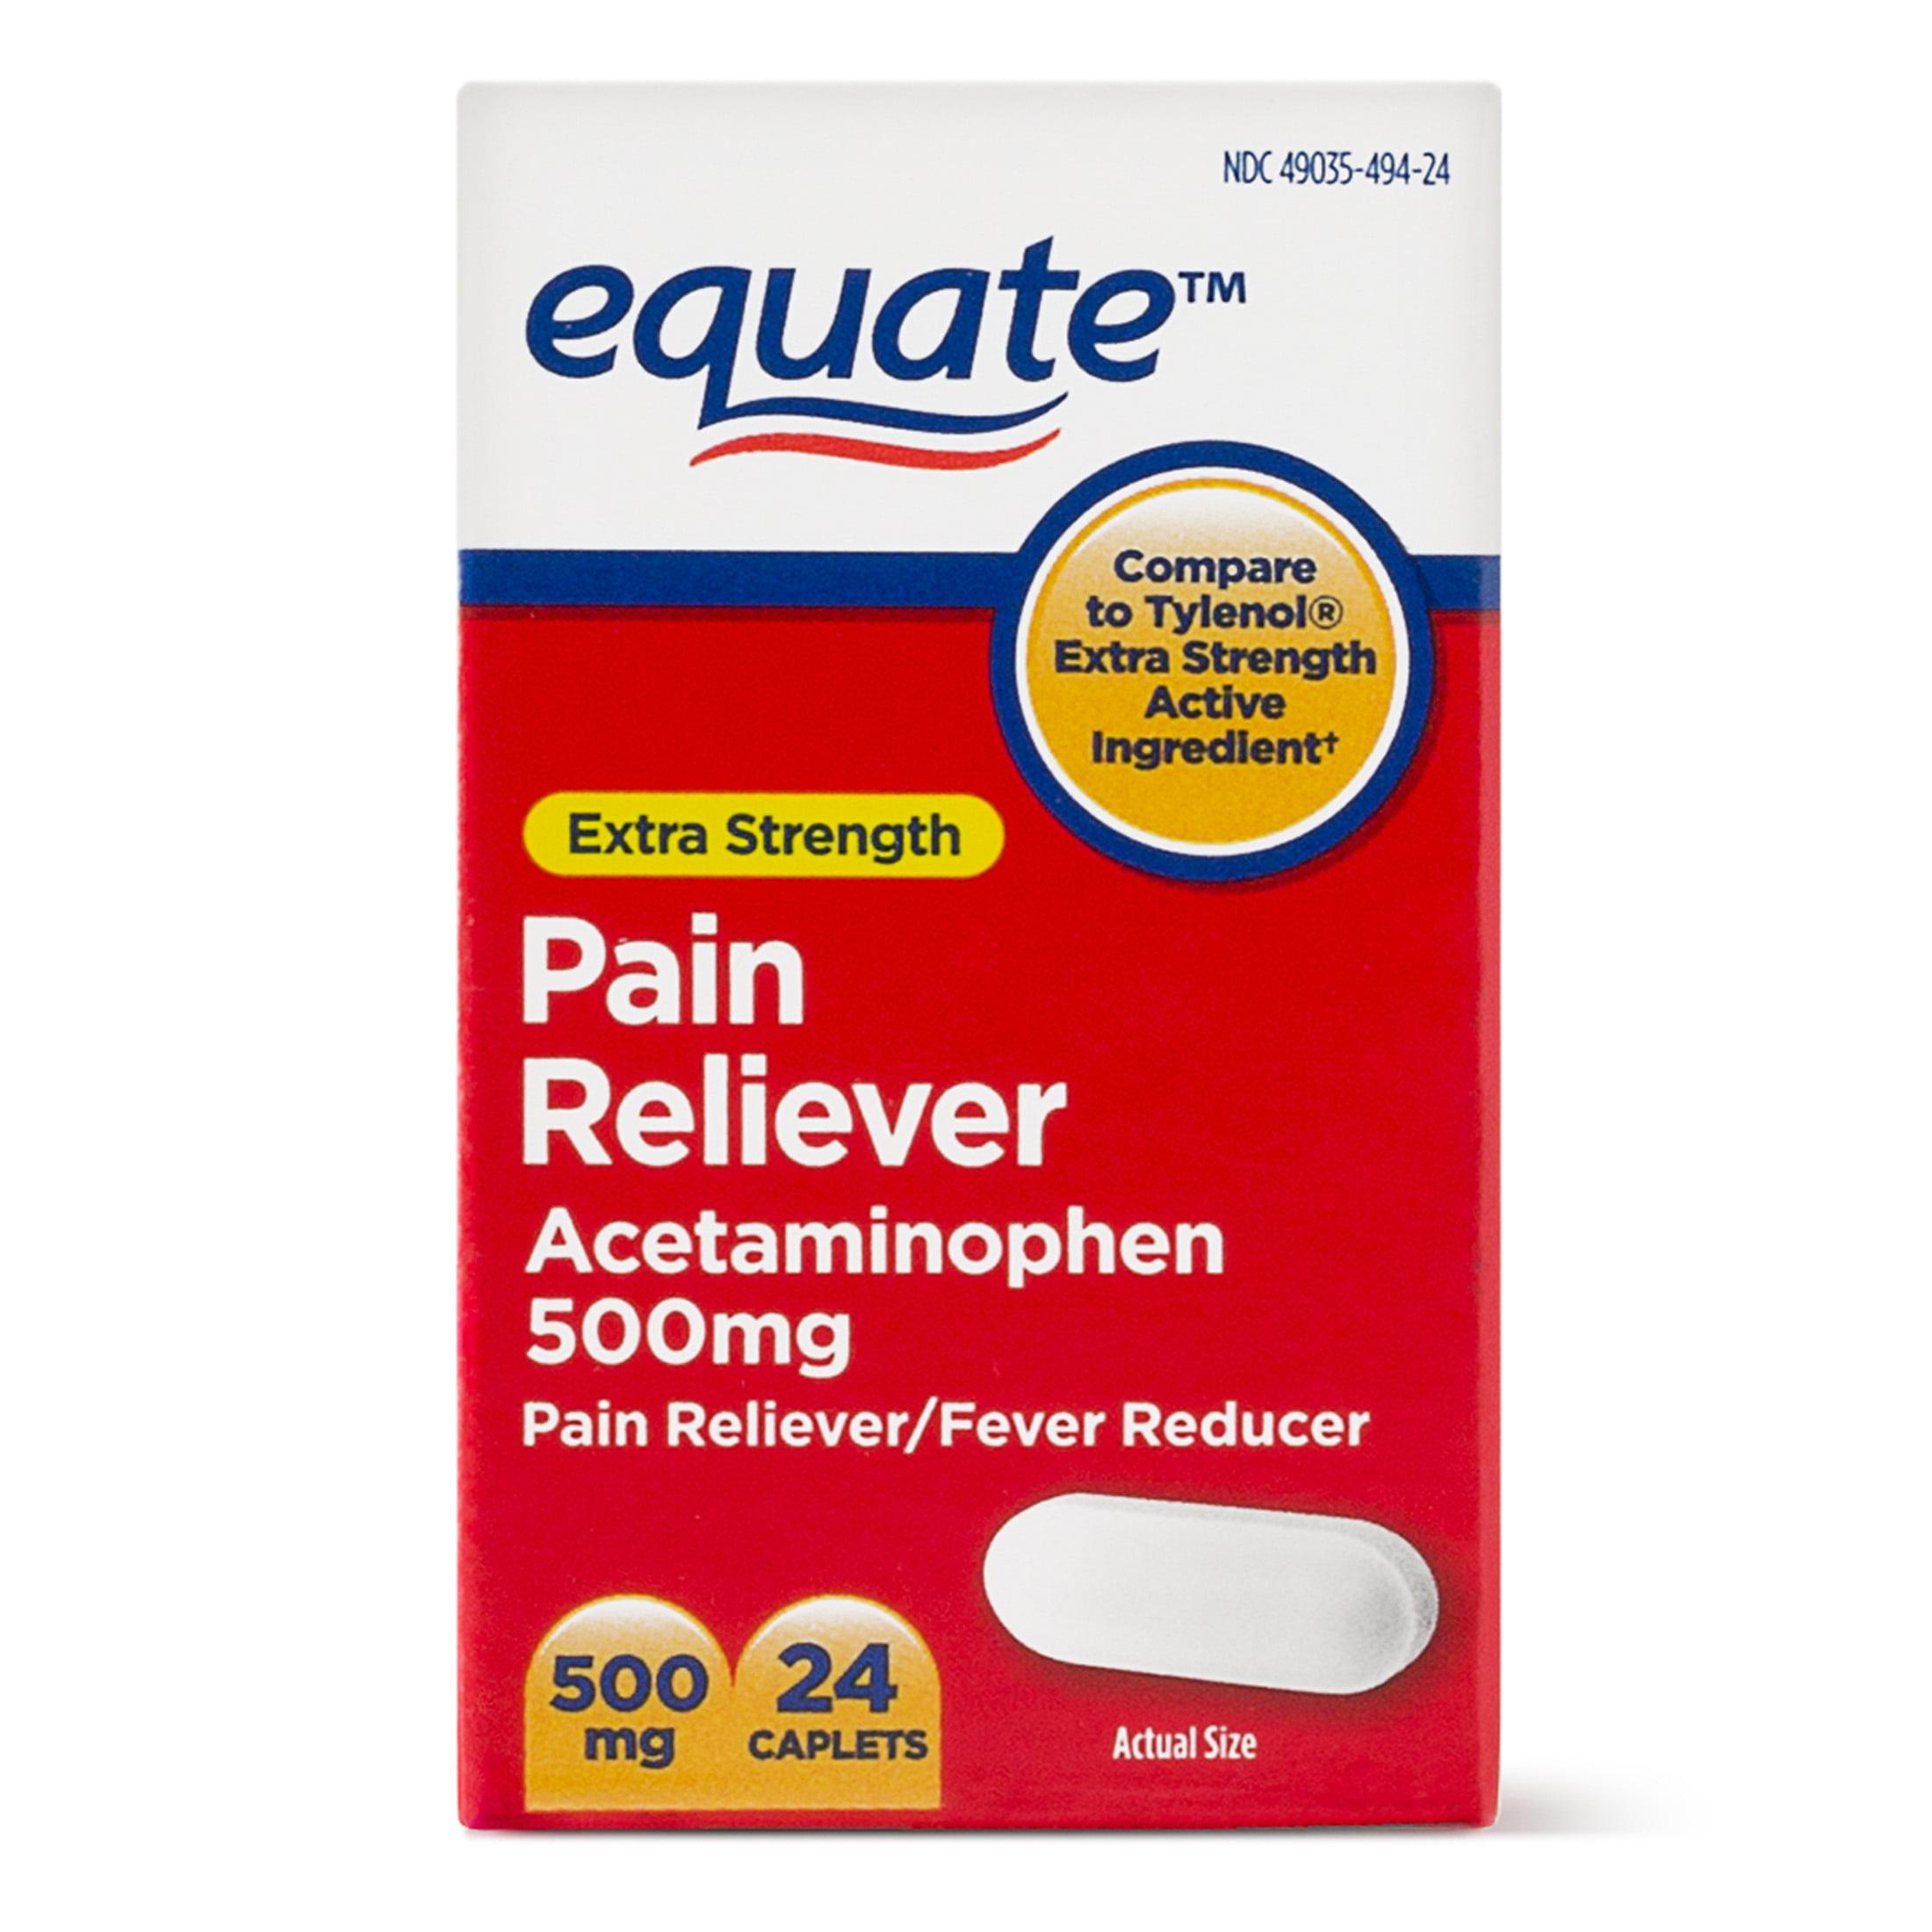 Equate Extra Strength Acetaminophen Caplets 500 Mg 24 Ct